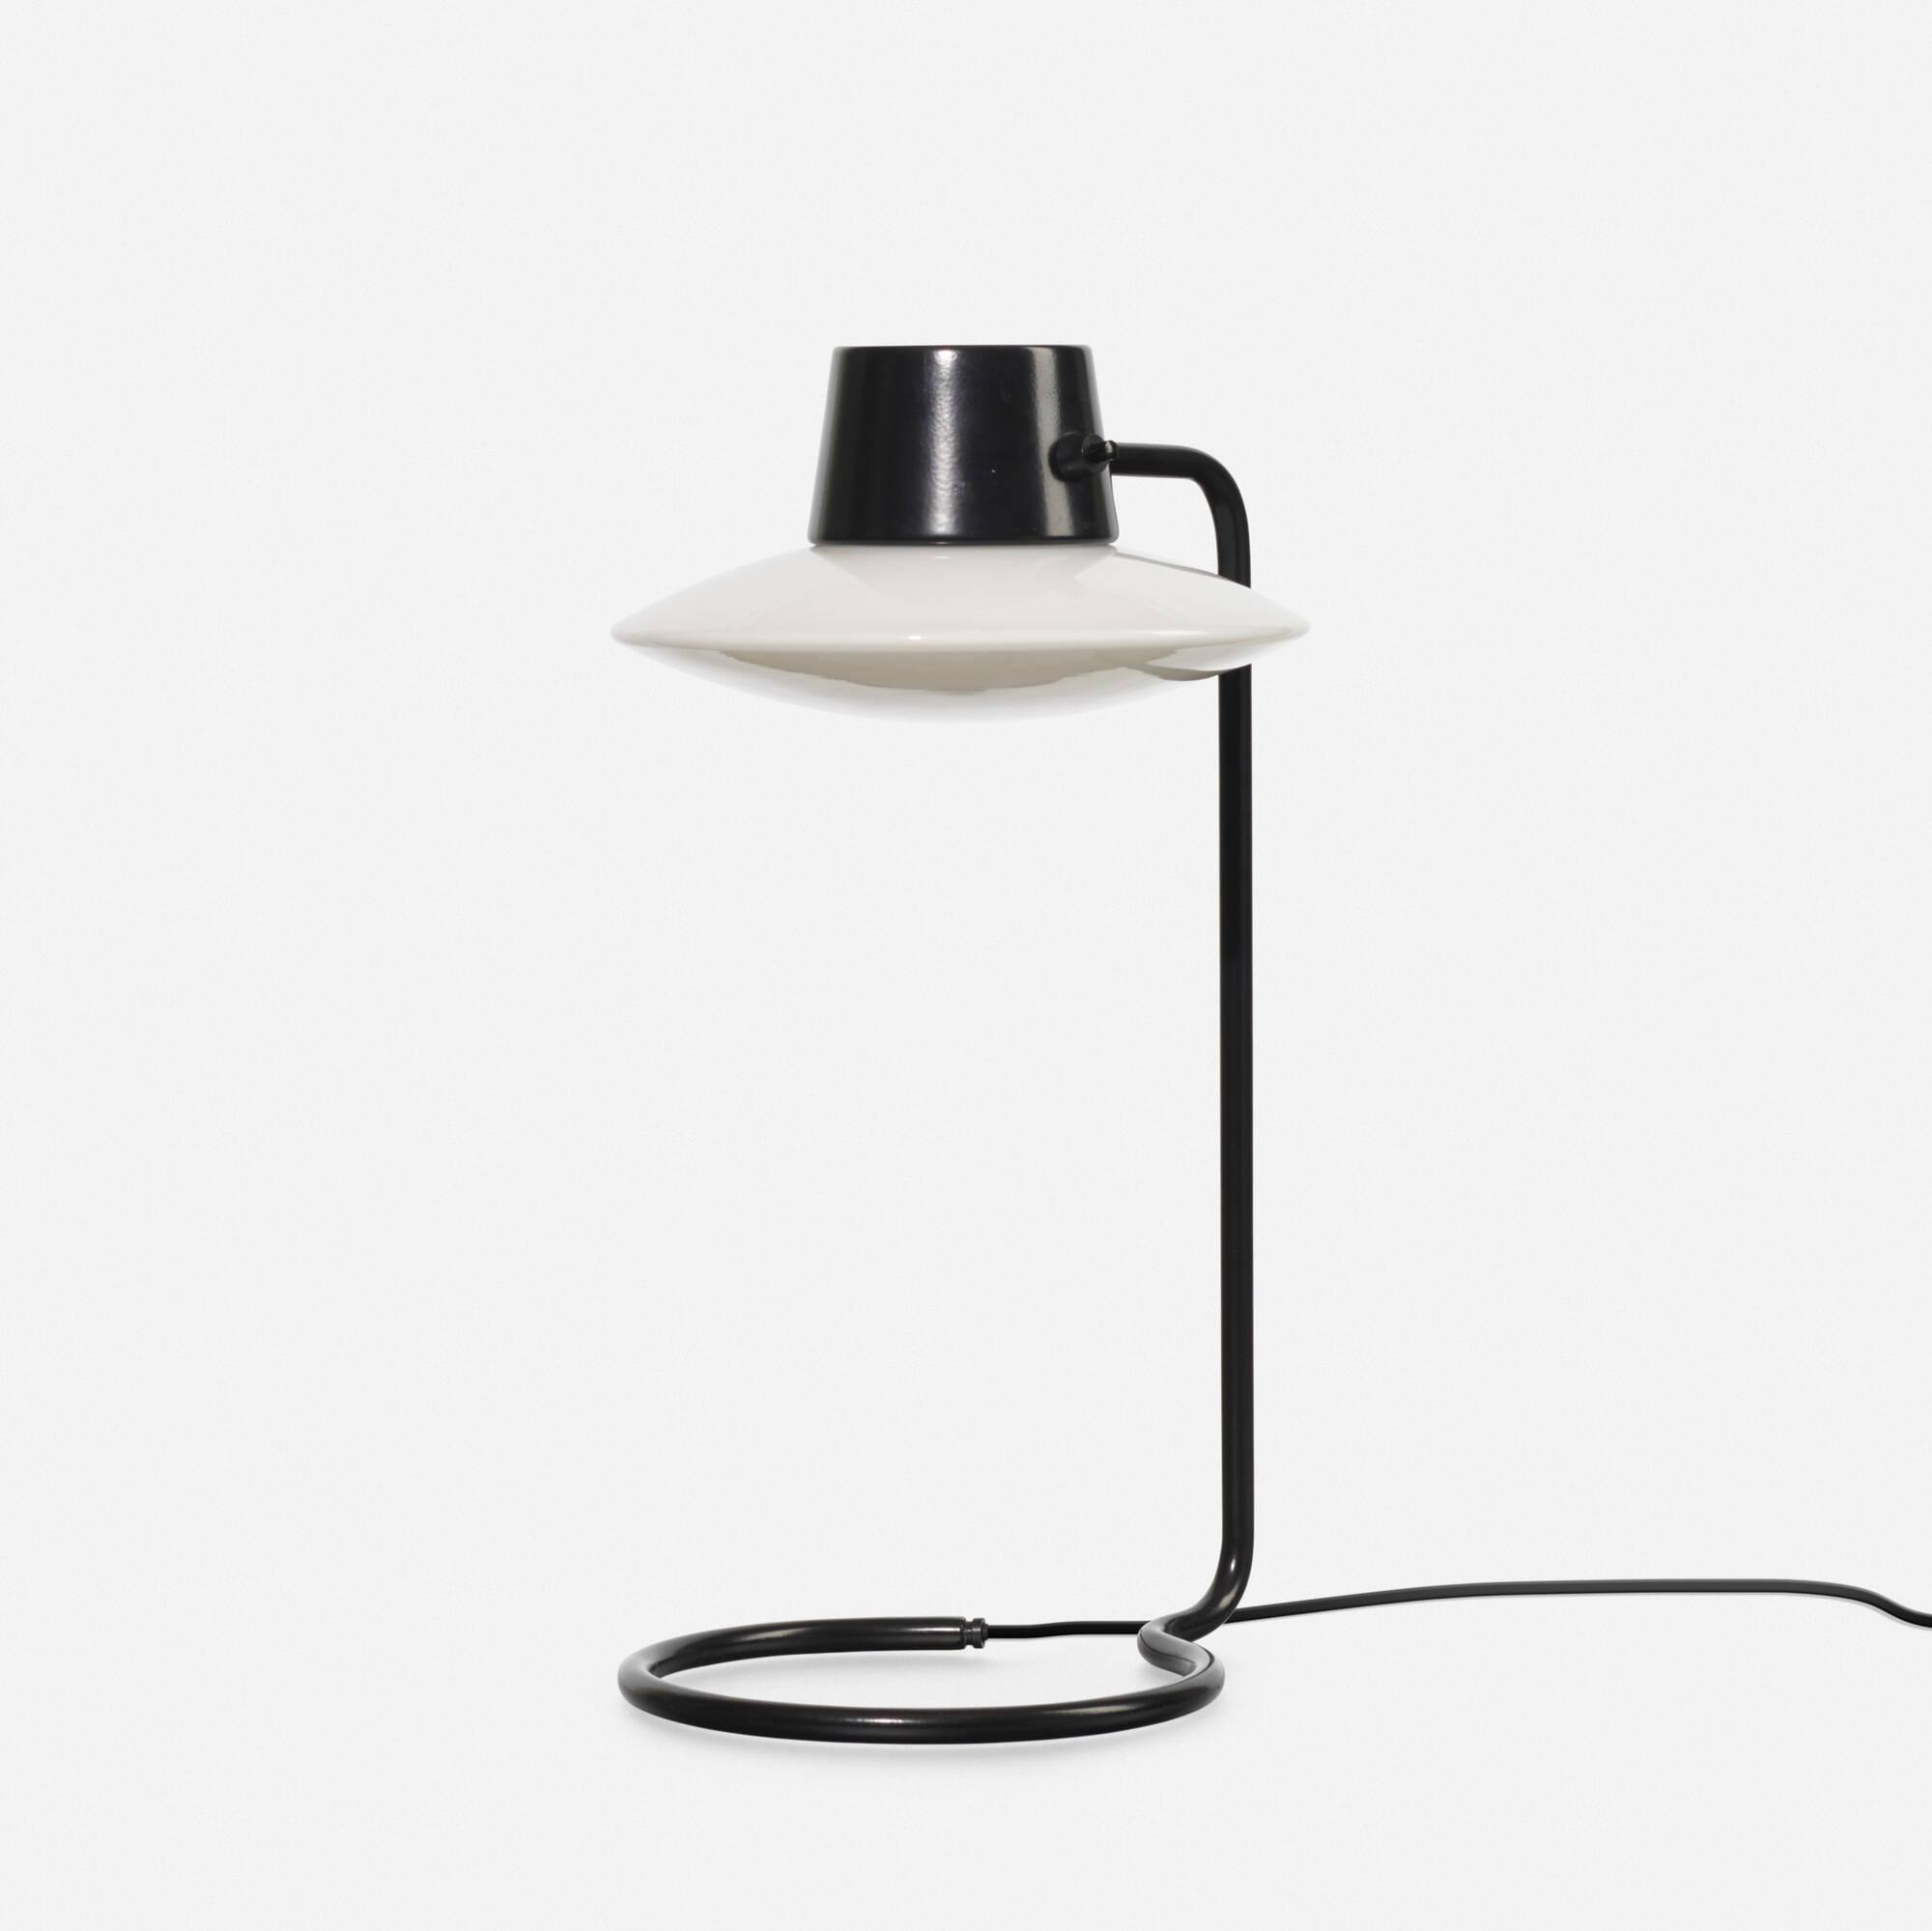 378: Arne Jacobsen / Oxford table lamp (1 of 1)